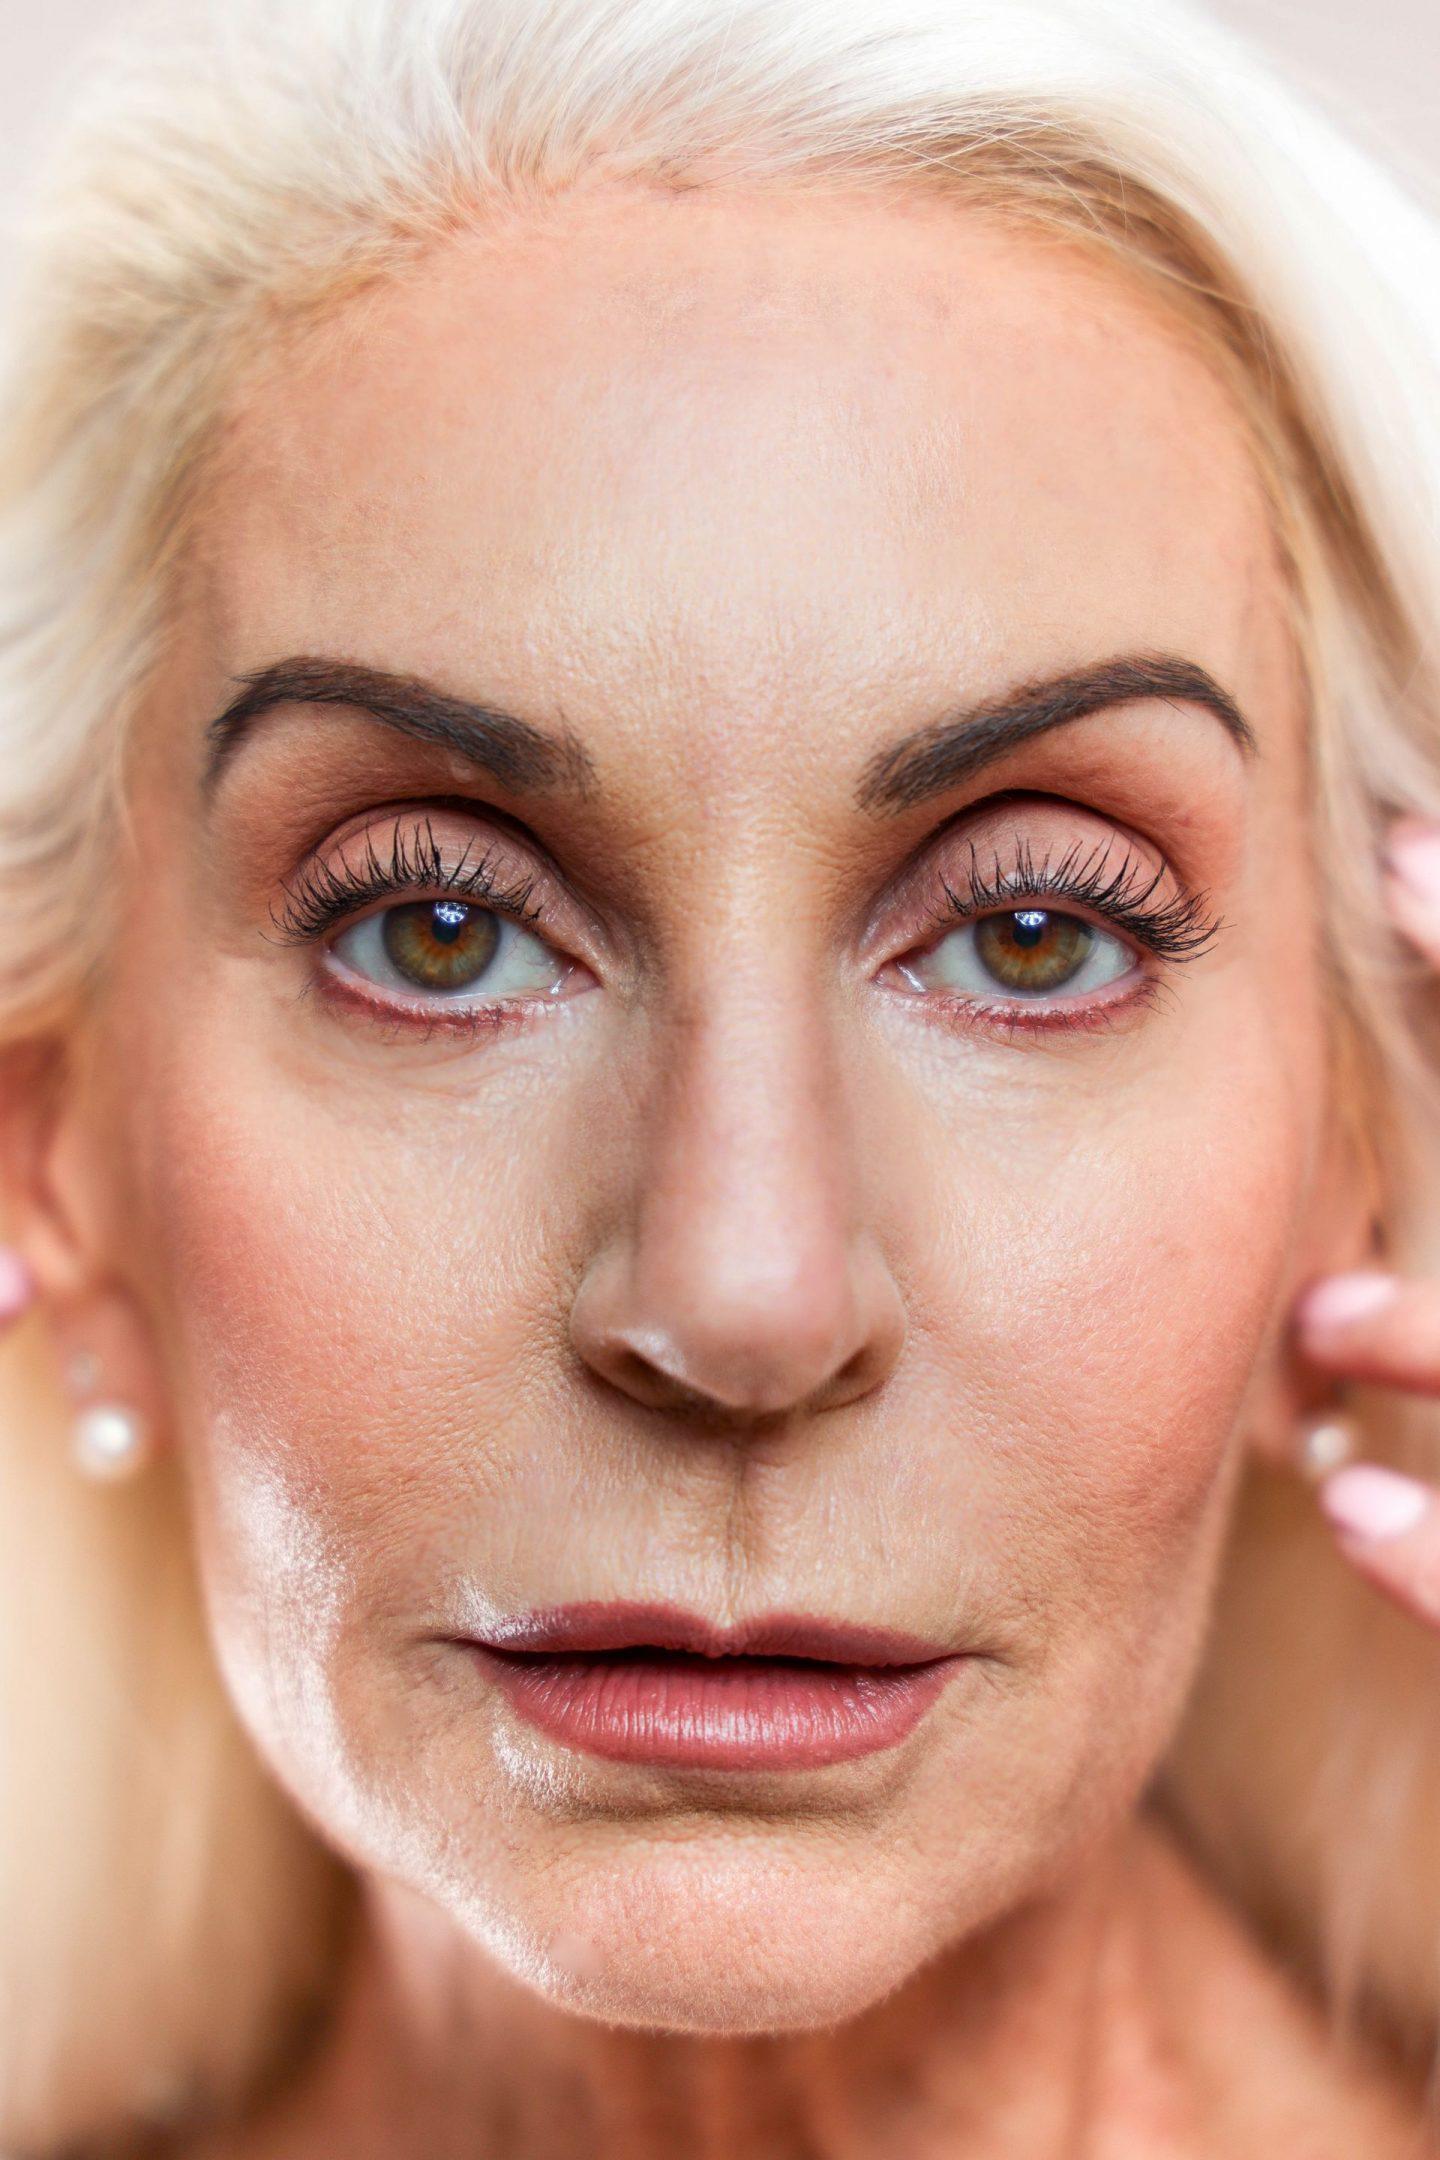 sen organics, mature model makeup look, mature beauty model, skincare